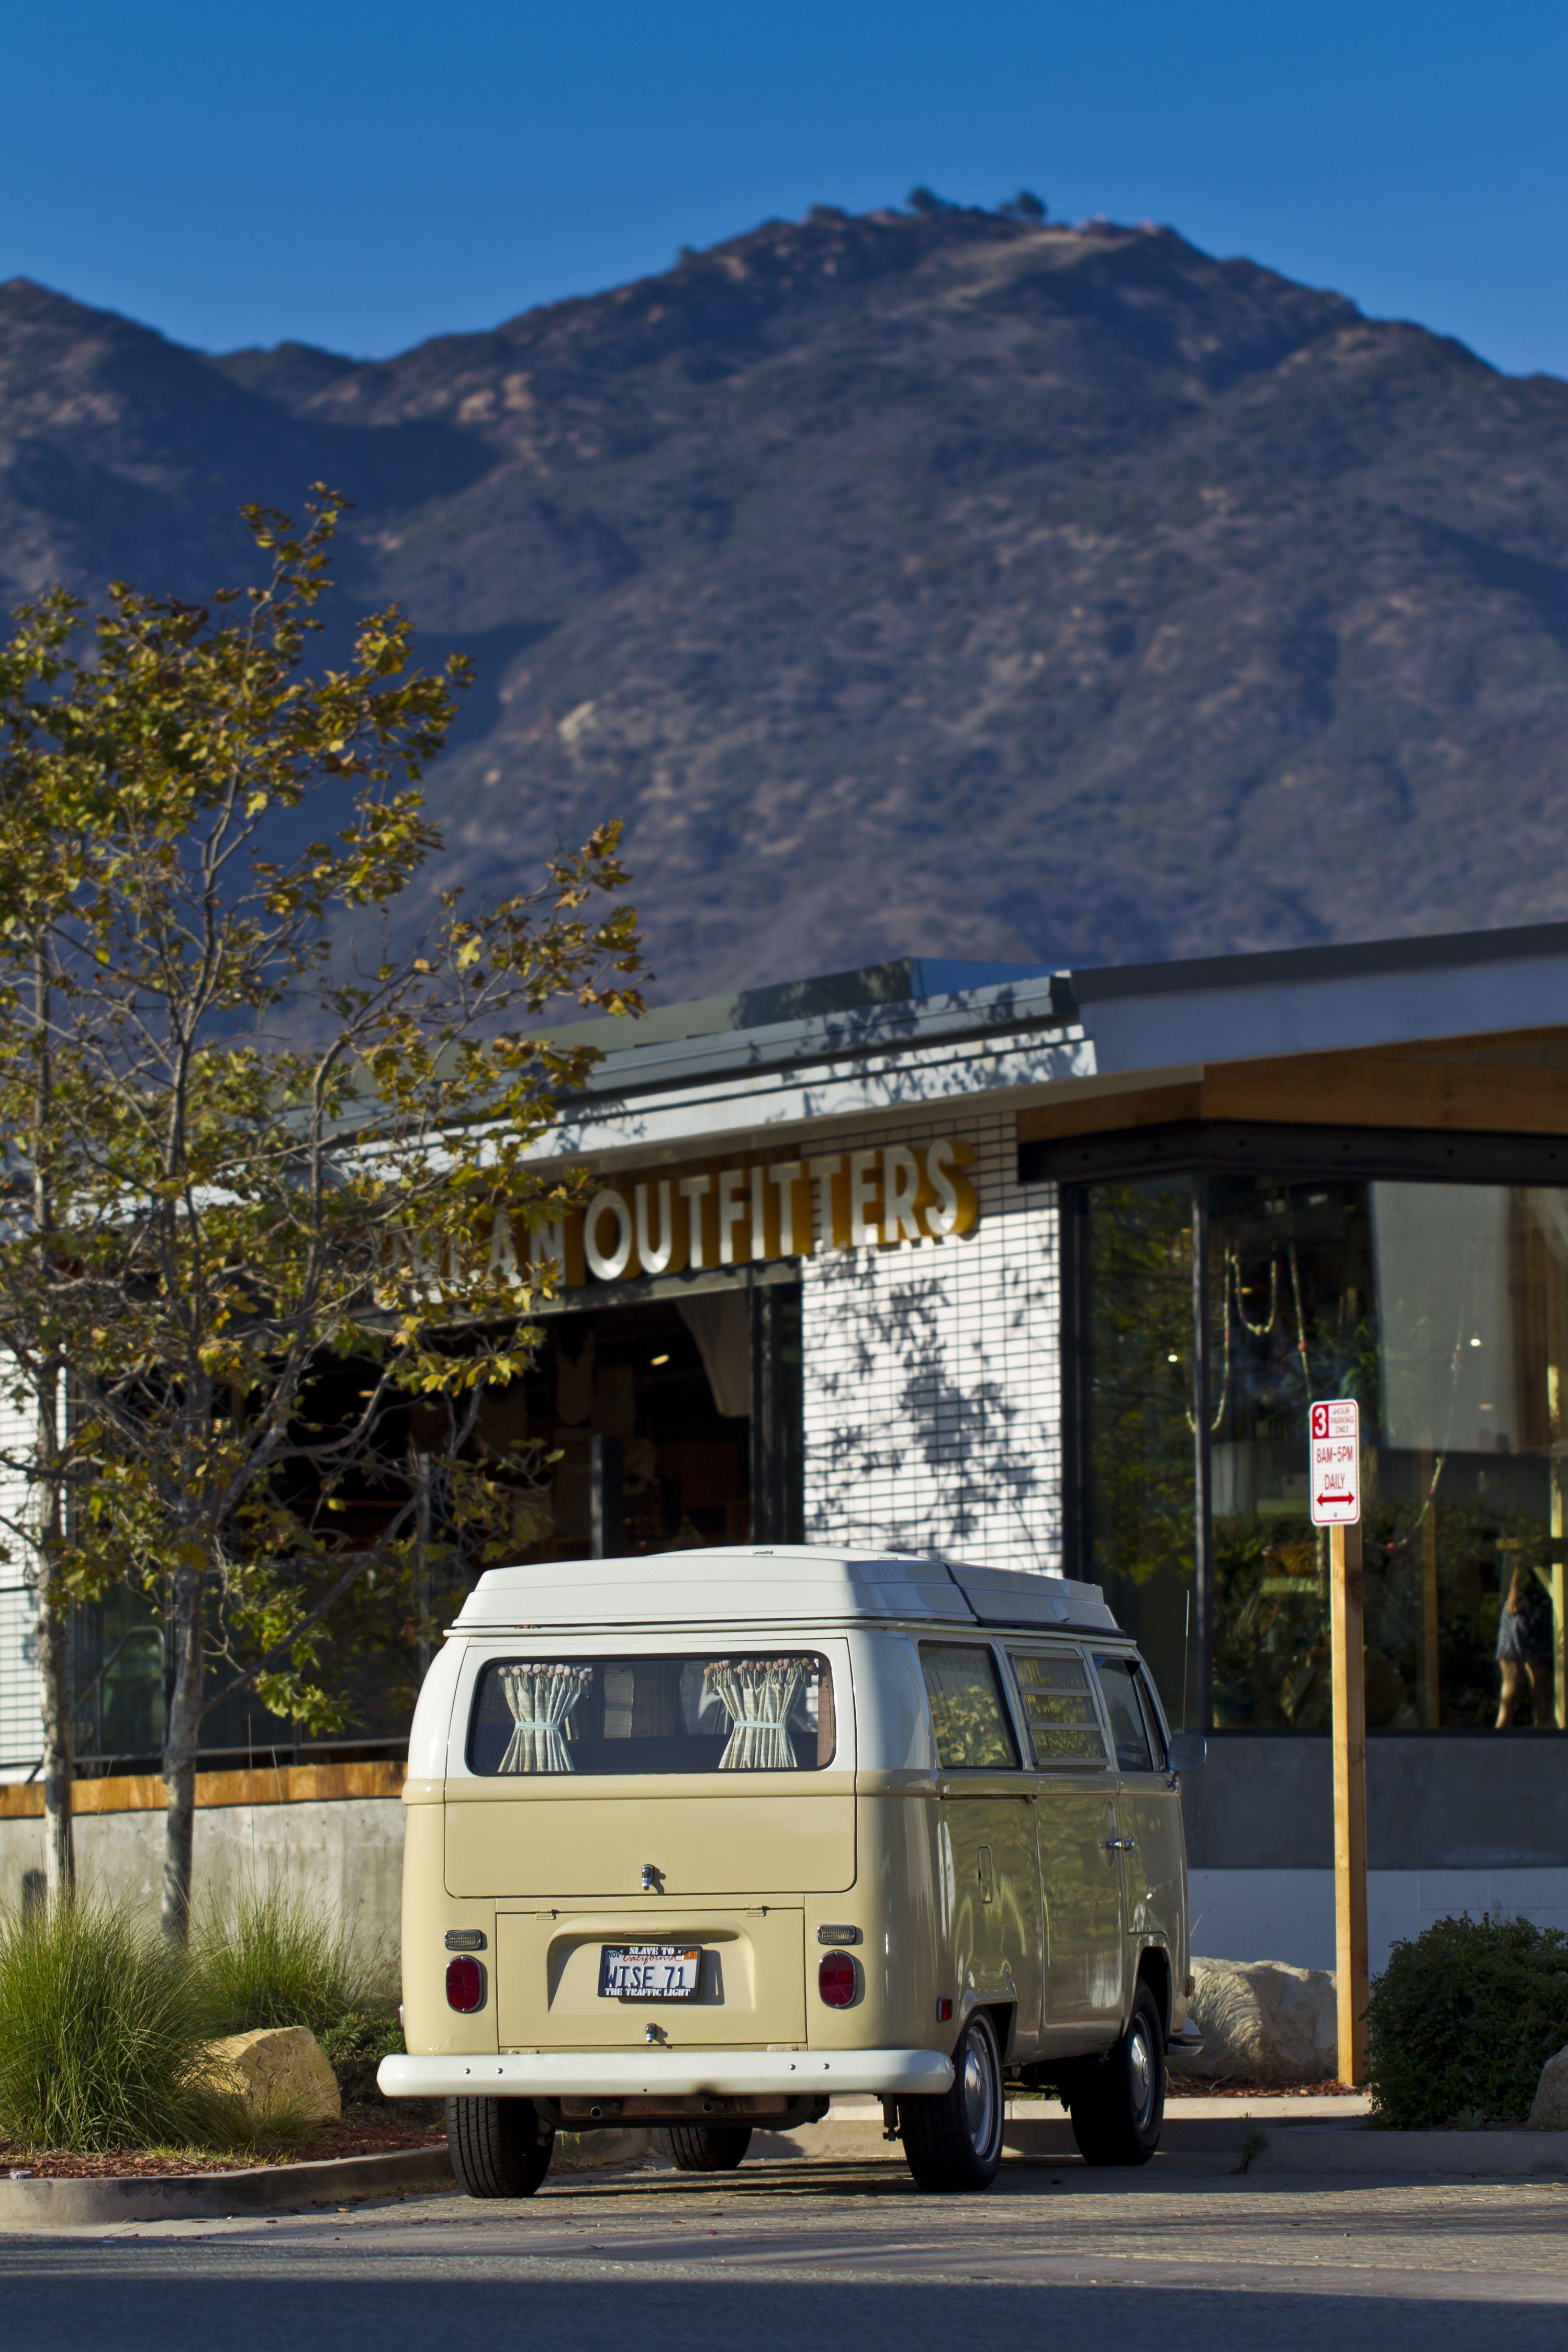 UO Malibu, opened August 2013